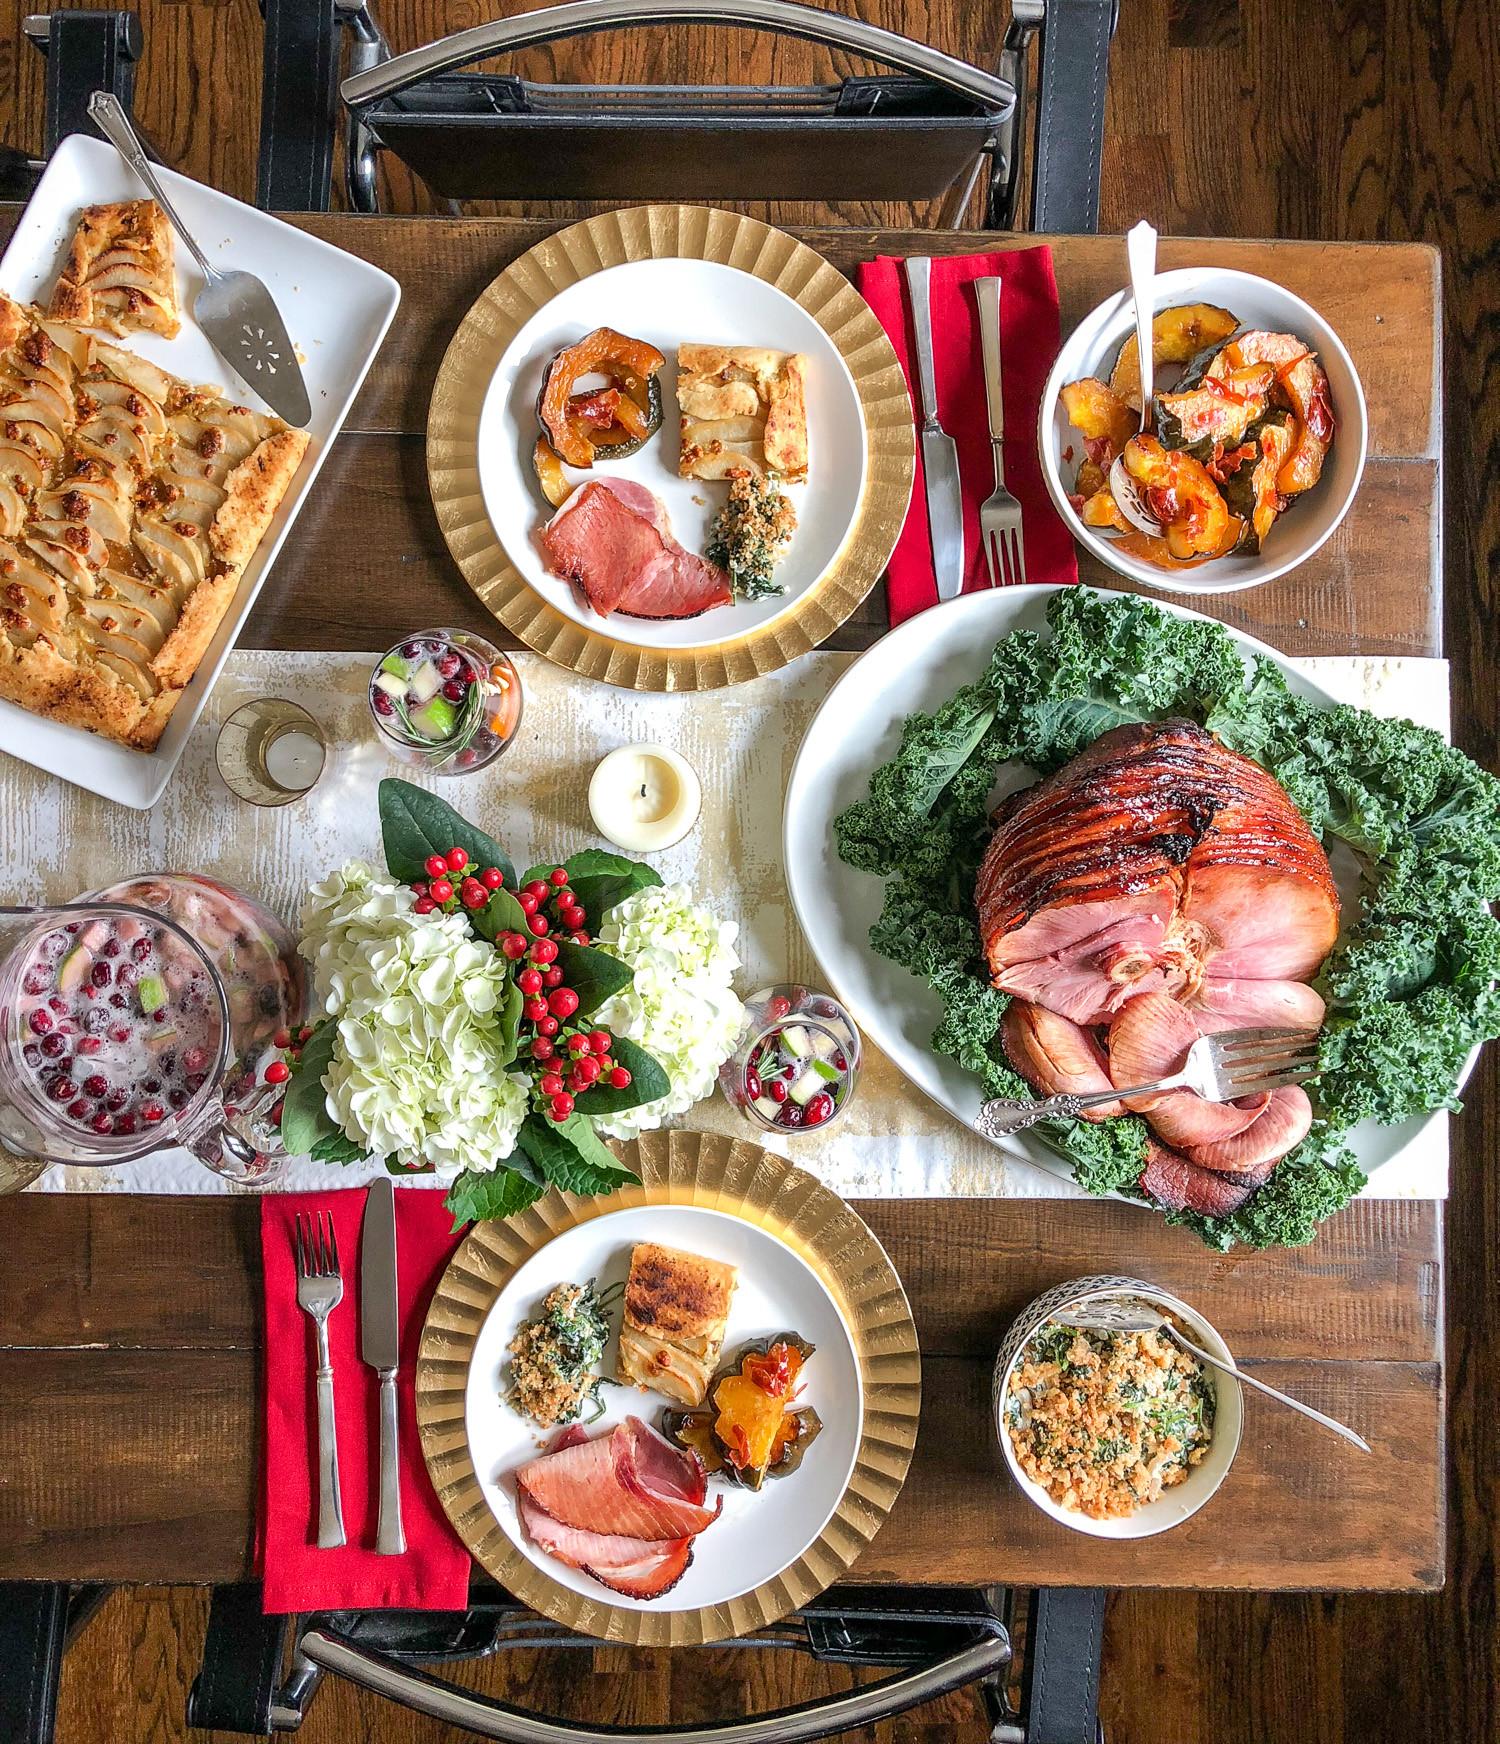 Christmas Recipes Dinner  Christmas Dinner Menu Ideas Plan a Memorable Meal for